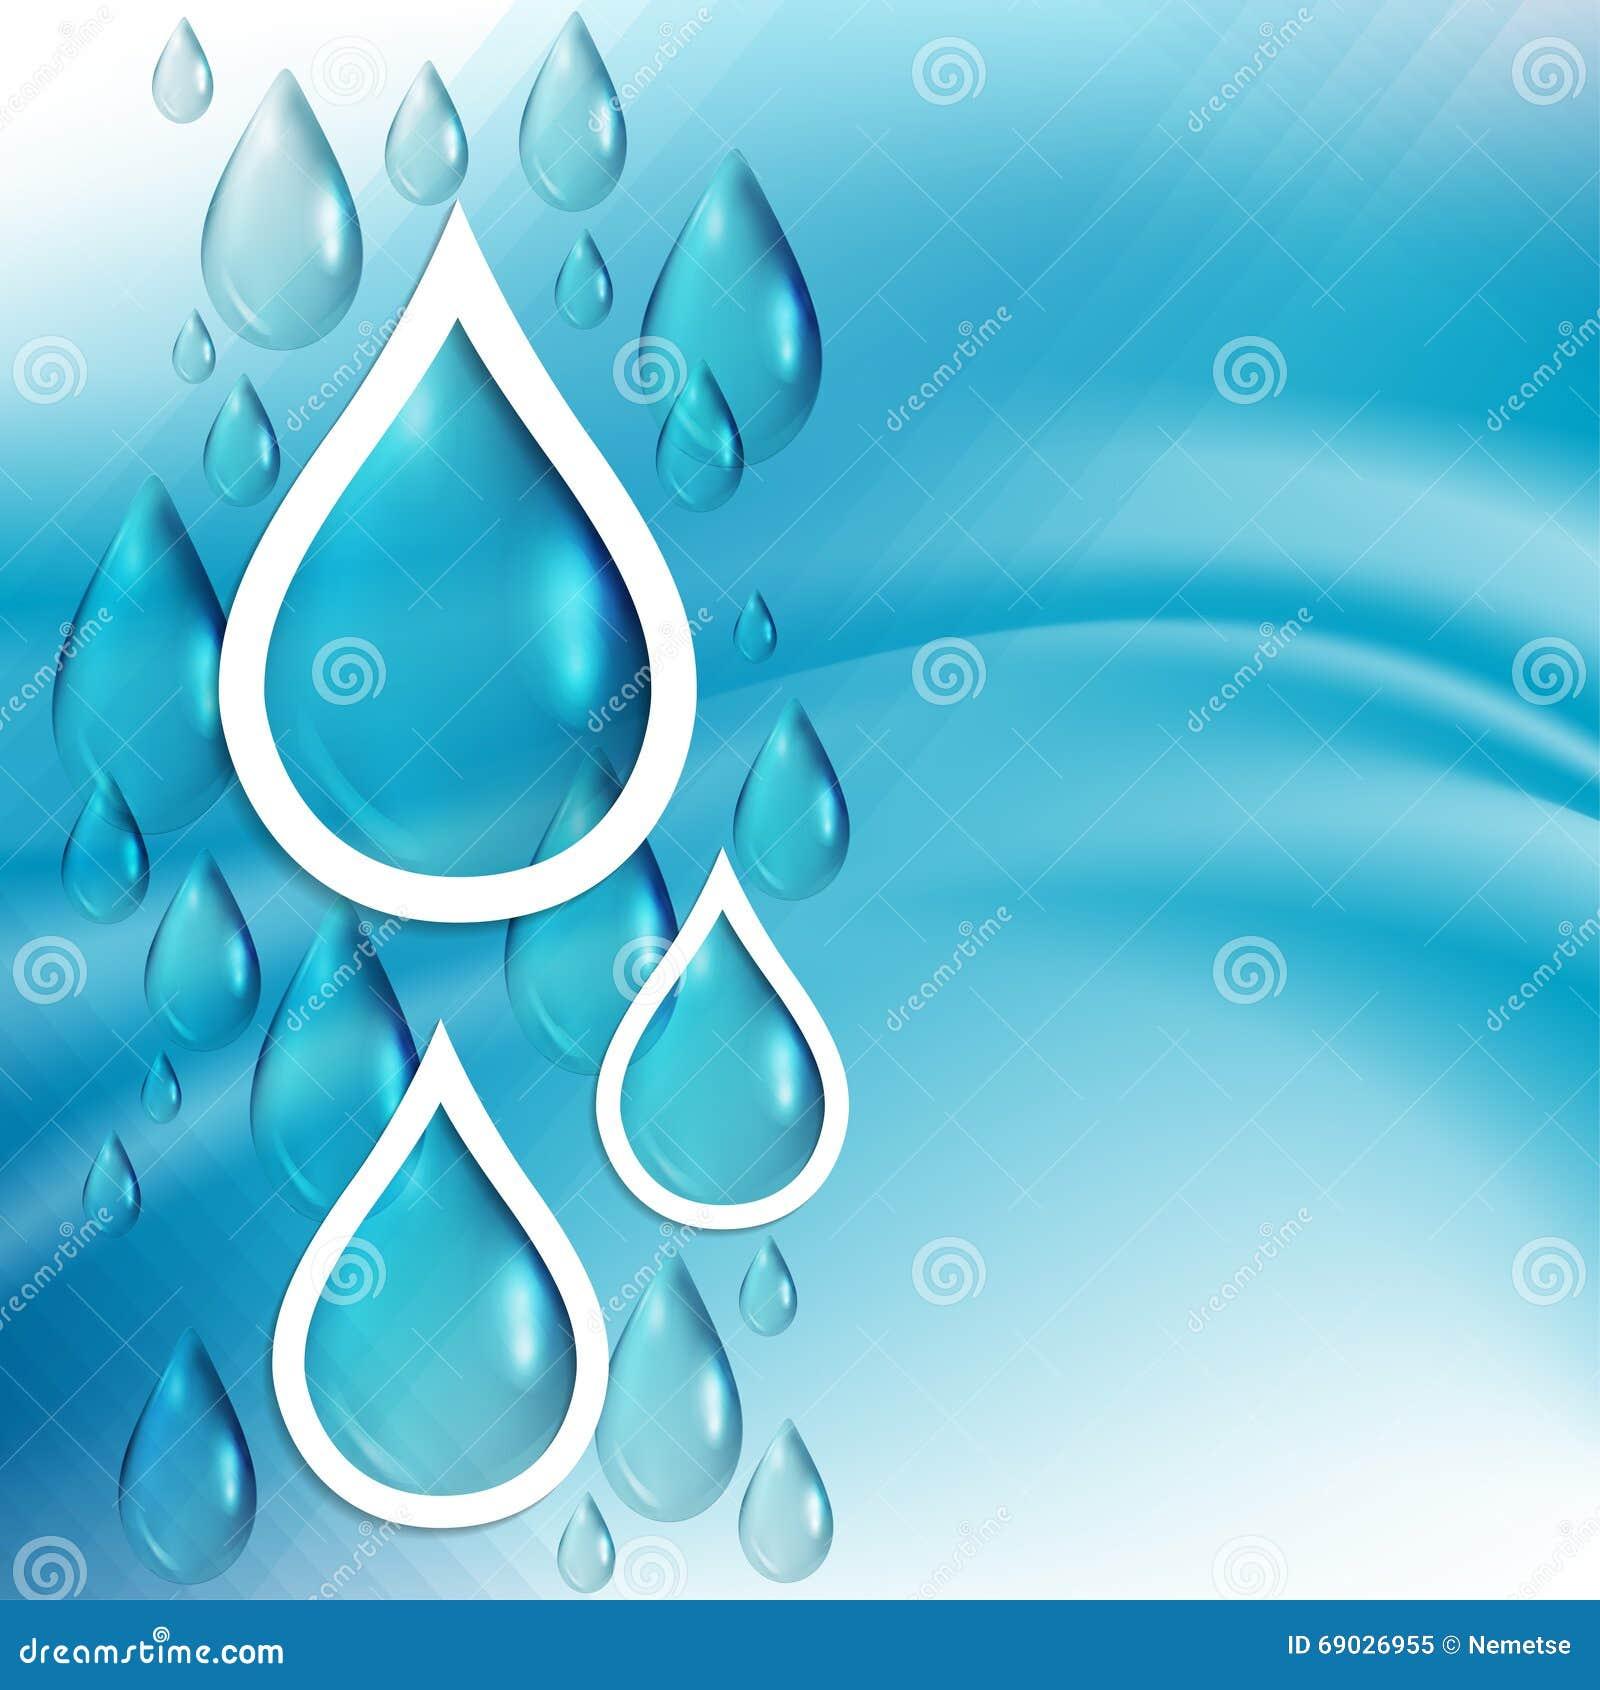 Абстрактная голубая предпосылка с водой падает, шаблон для дизайна